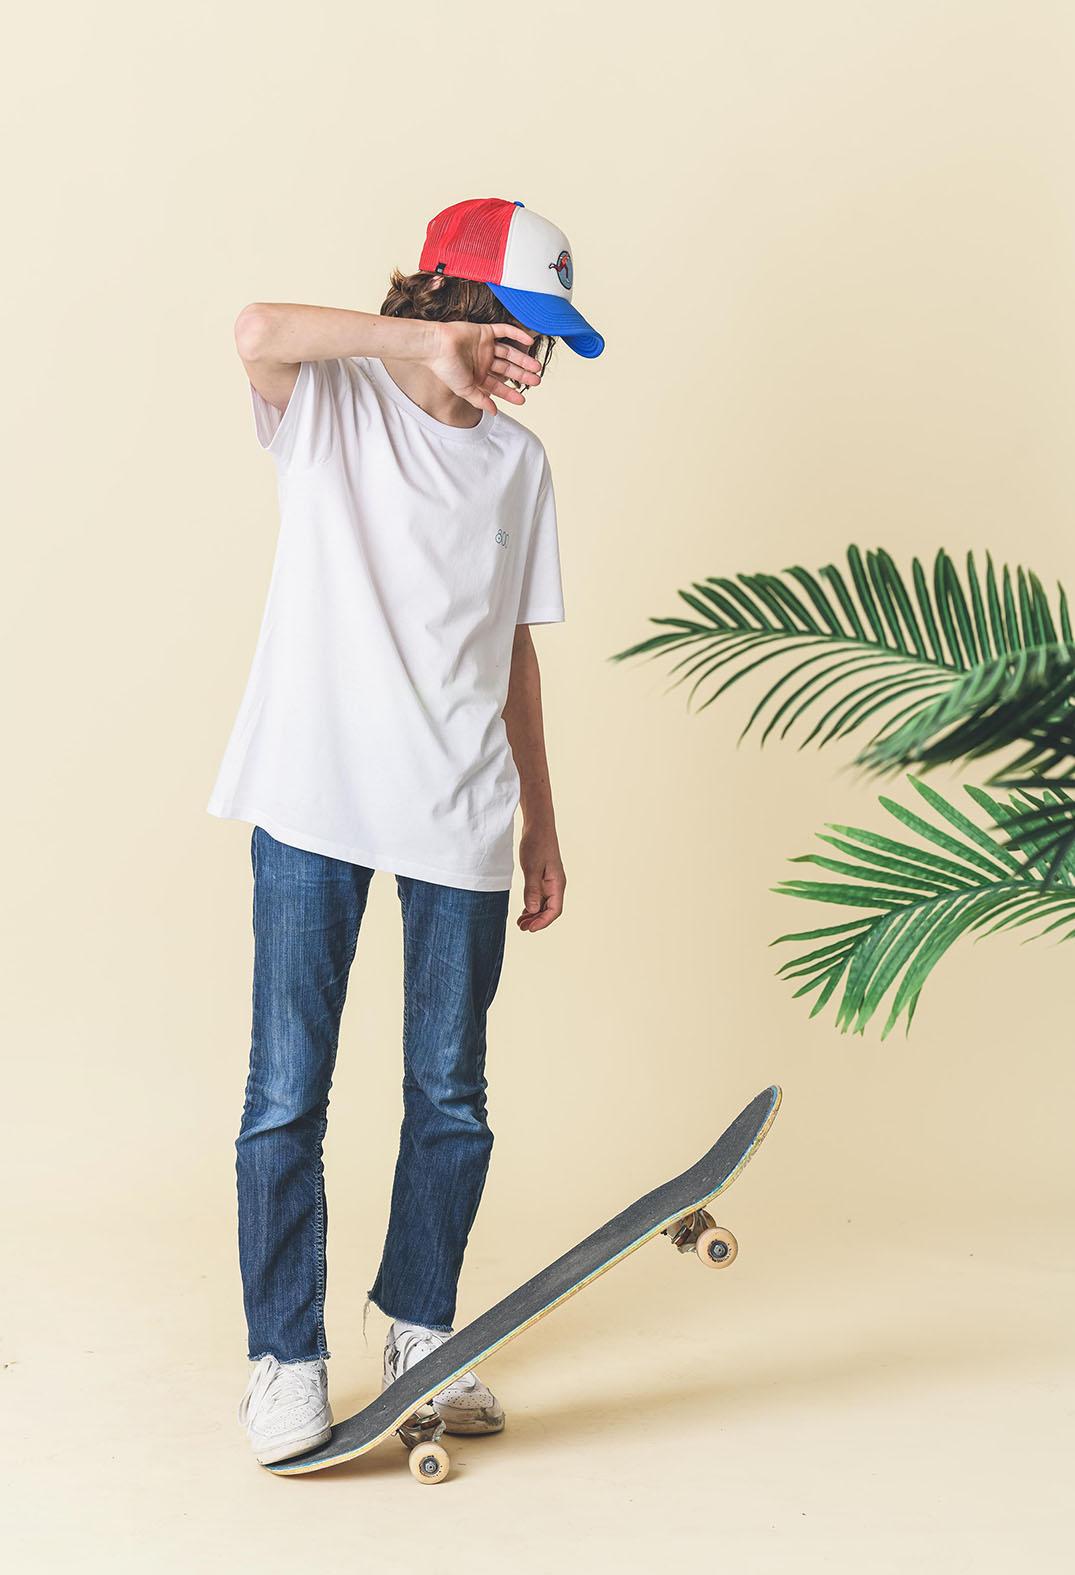 Laurent-scavone-photographe-mode-studio-lille-14